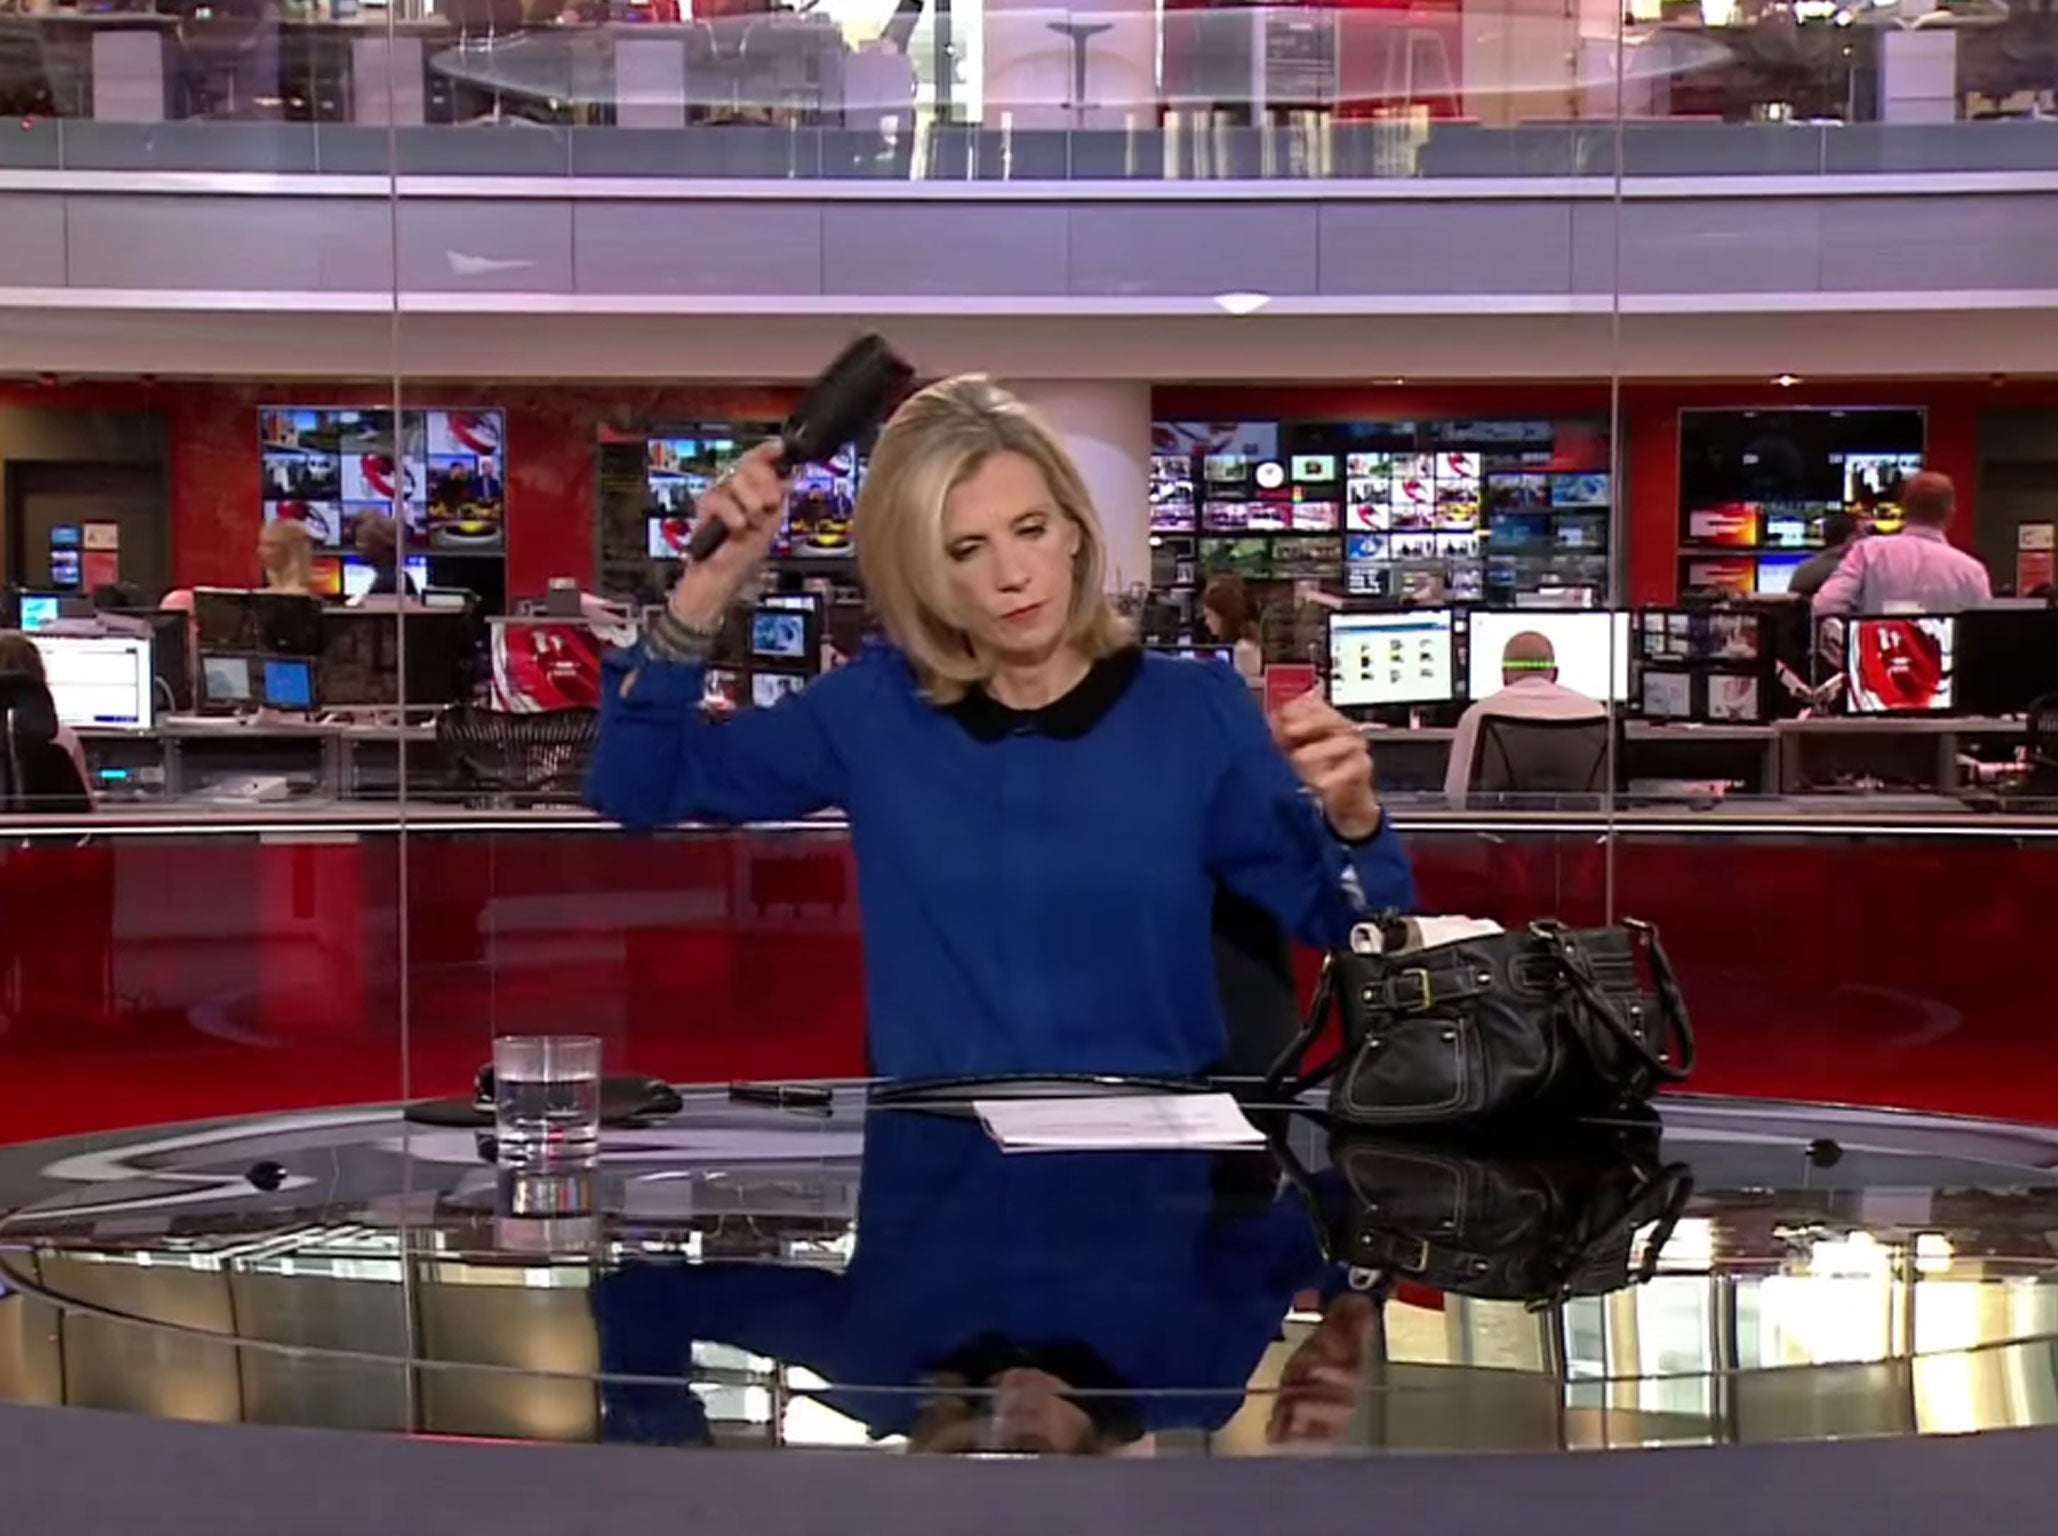 BBC presenter Carol Walker caught brushing hair on live TV - but handles it like a pro